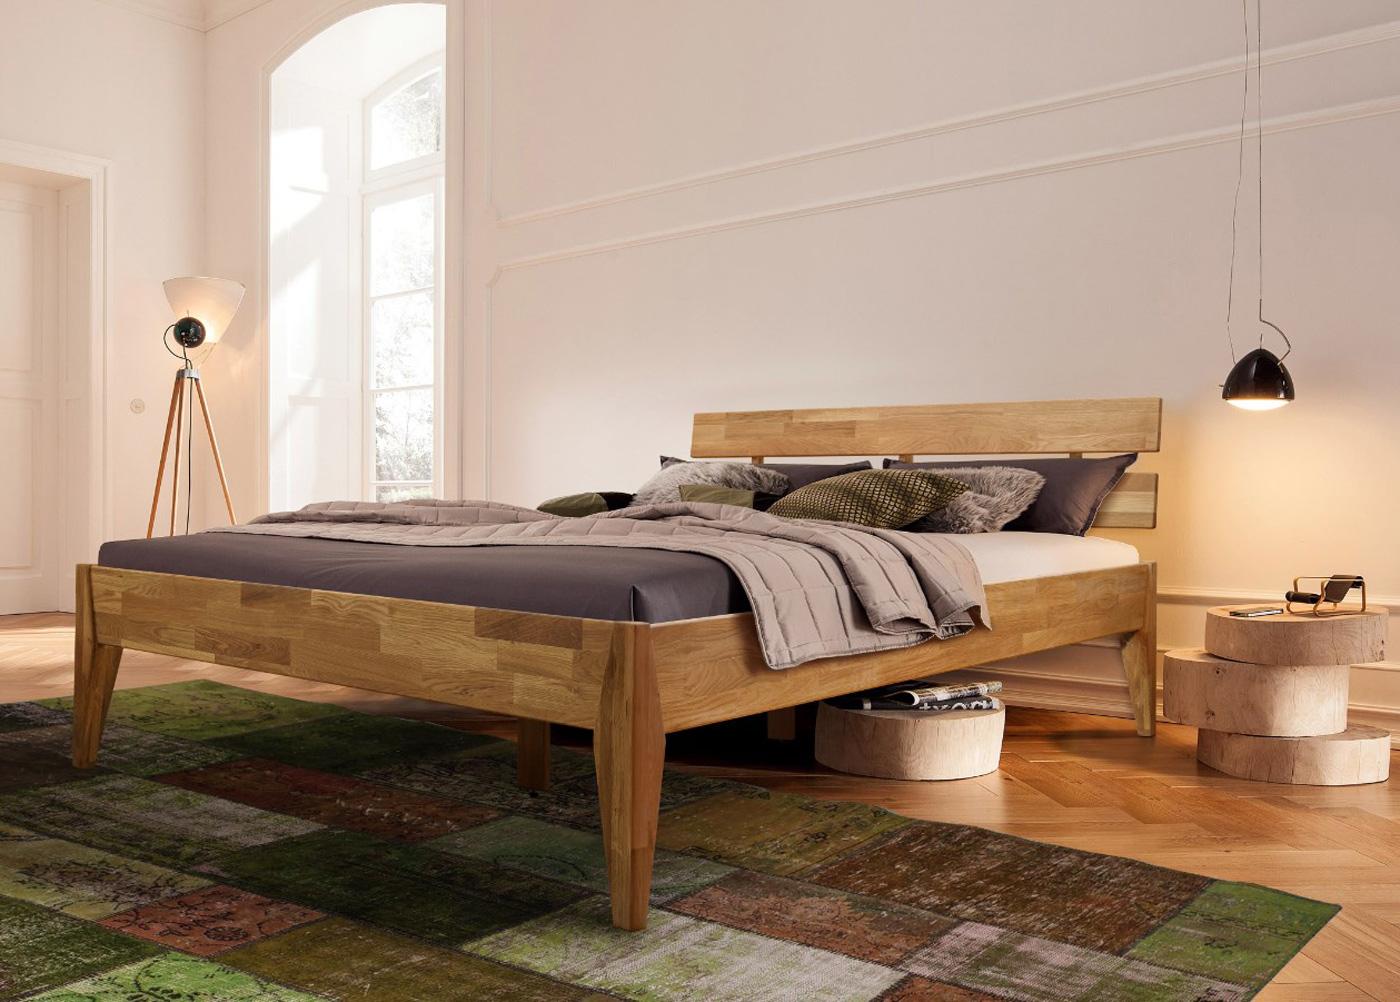 Tammi sänky ELKE 140x200 cm